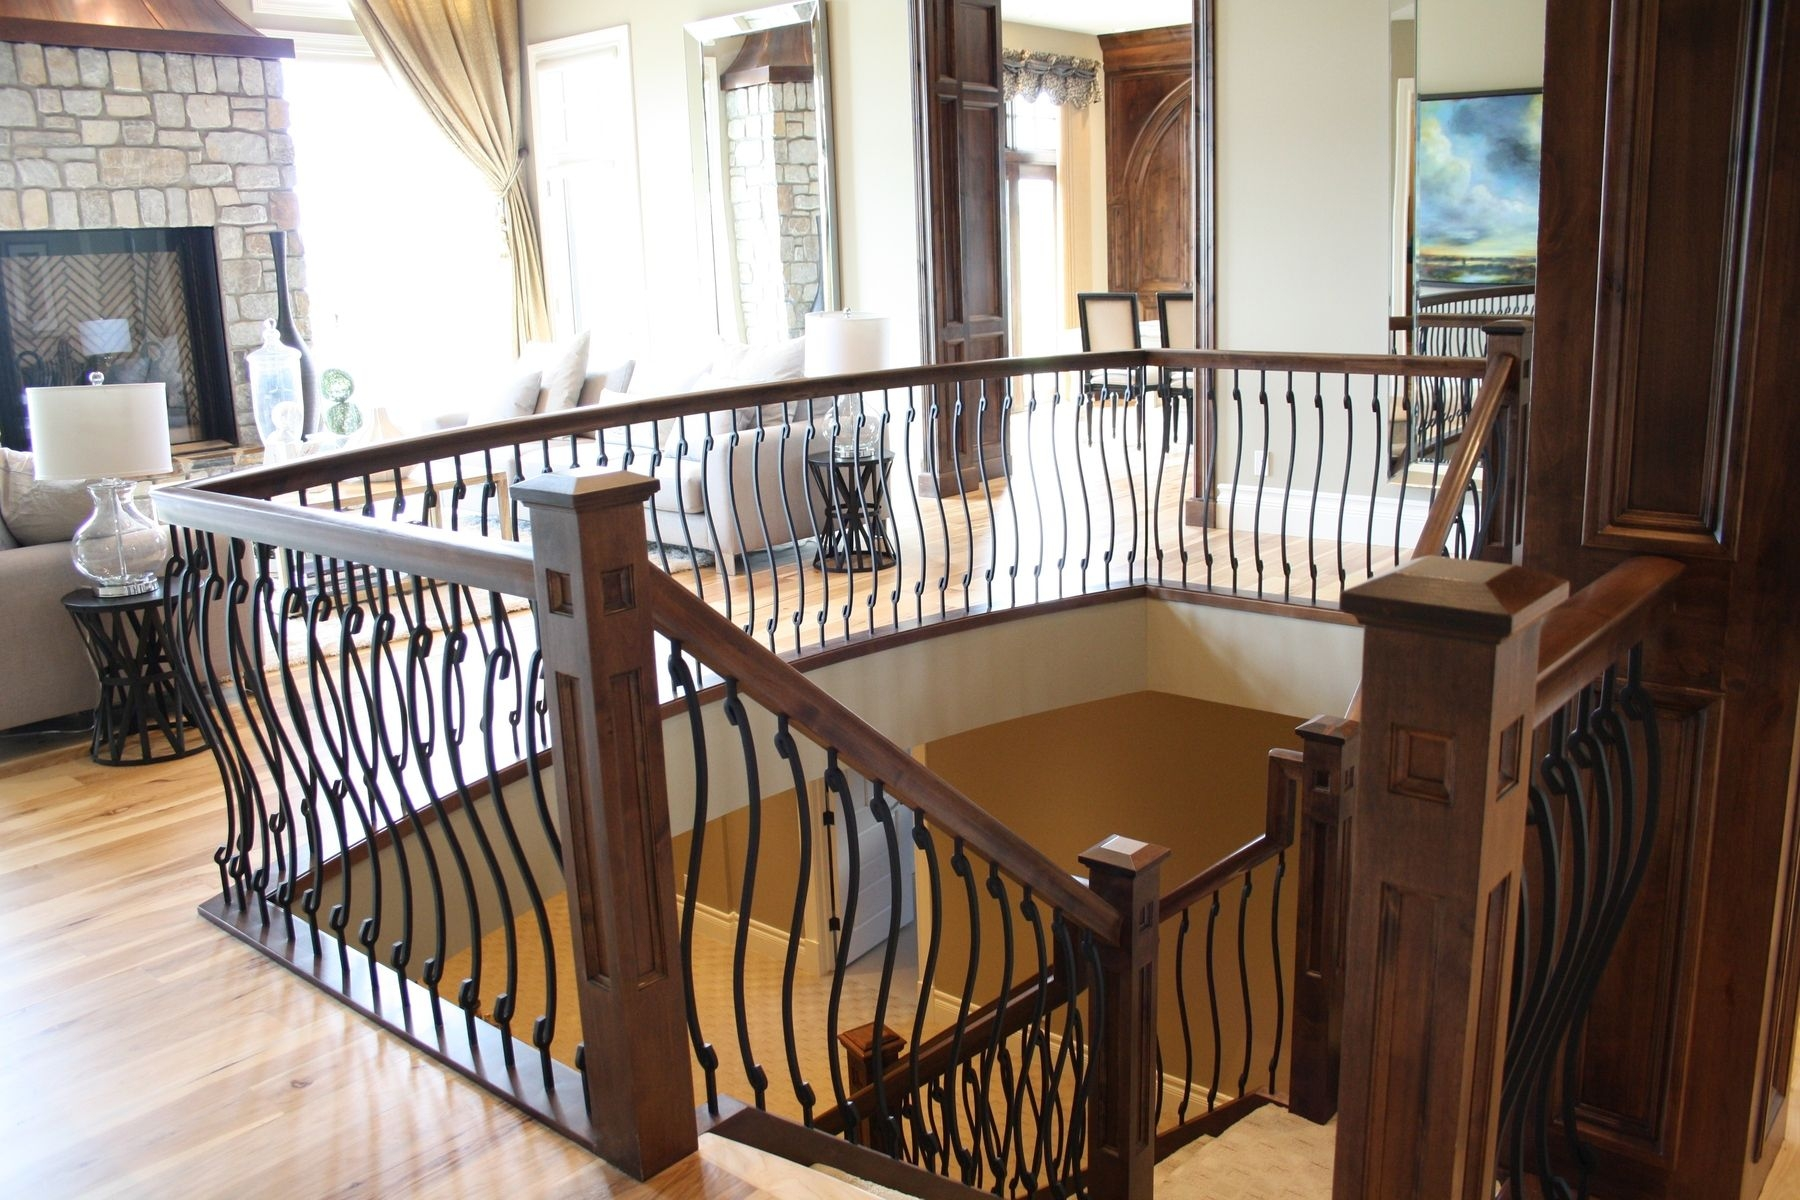 Custom Made Wood Stair Rail With S Shaped Spindles By Prestige   Custom Wood Stair Railing   Natural Wood   Barn Beam   Metal Spindle   Attic Stair   Rail